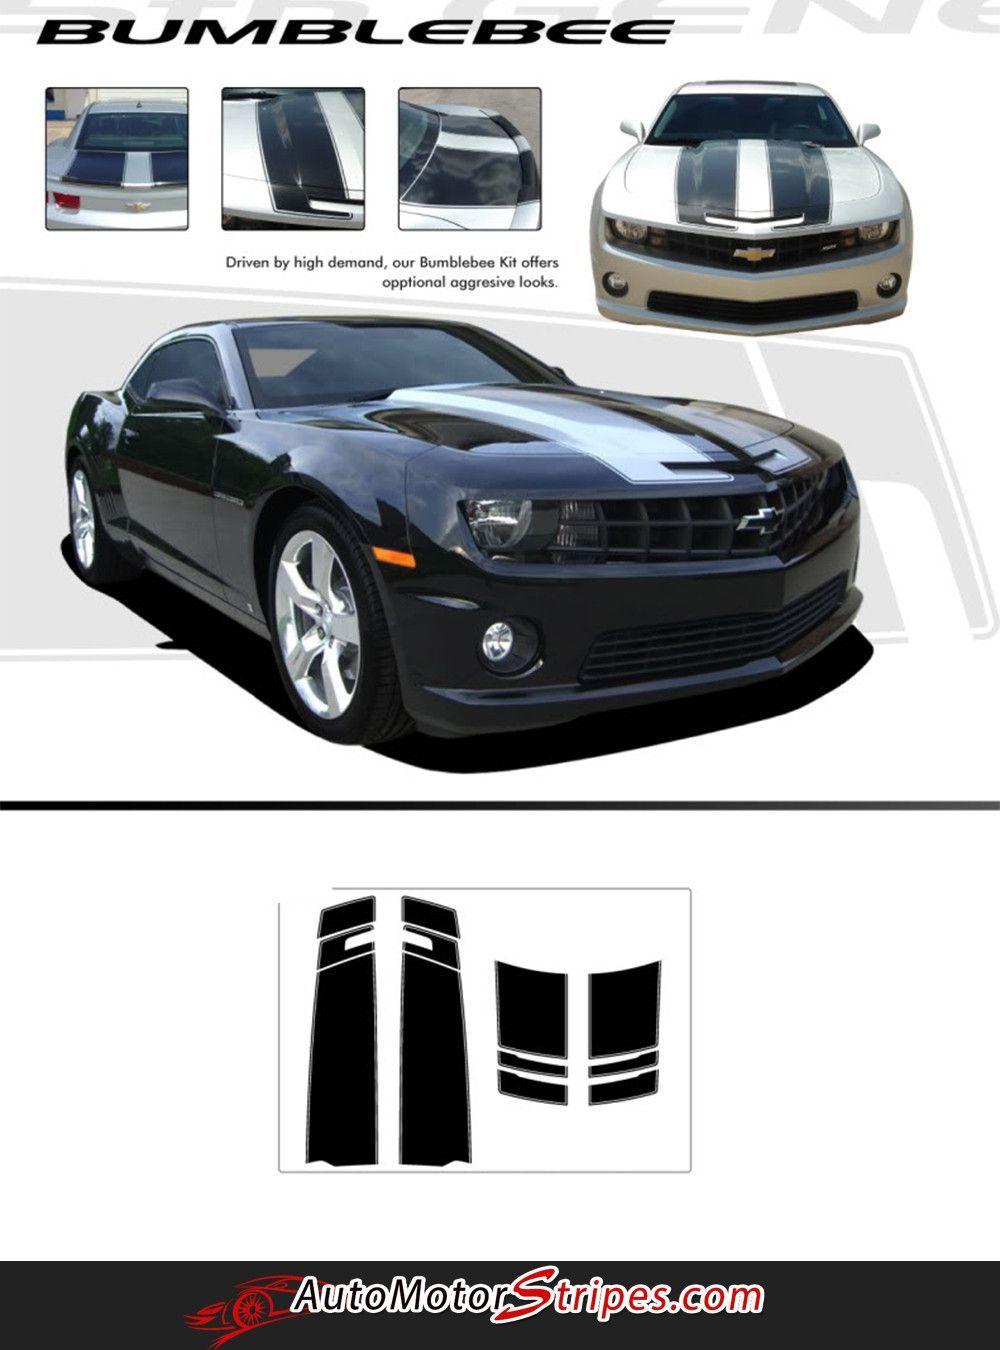 2010 2011 2012 2013 2014 Camaro SS RS LS LT Super Rally Sport Decals Stripes Kit